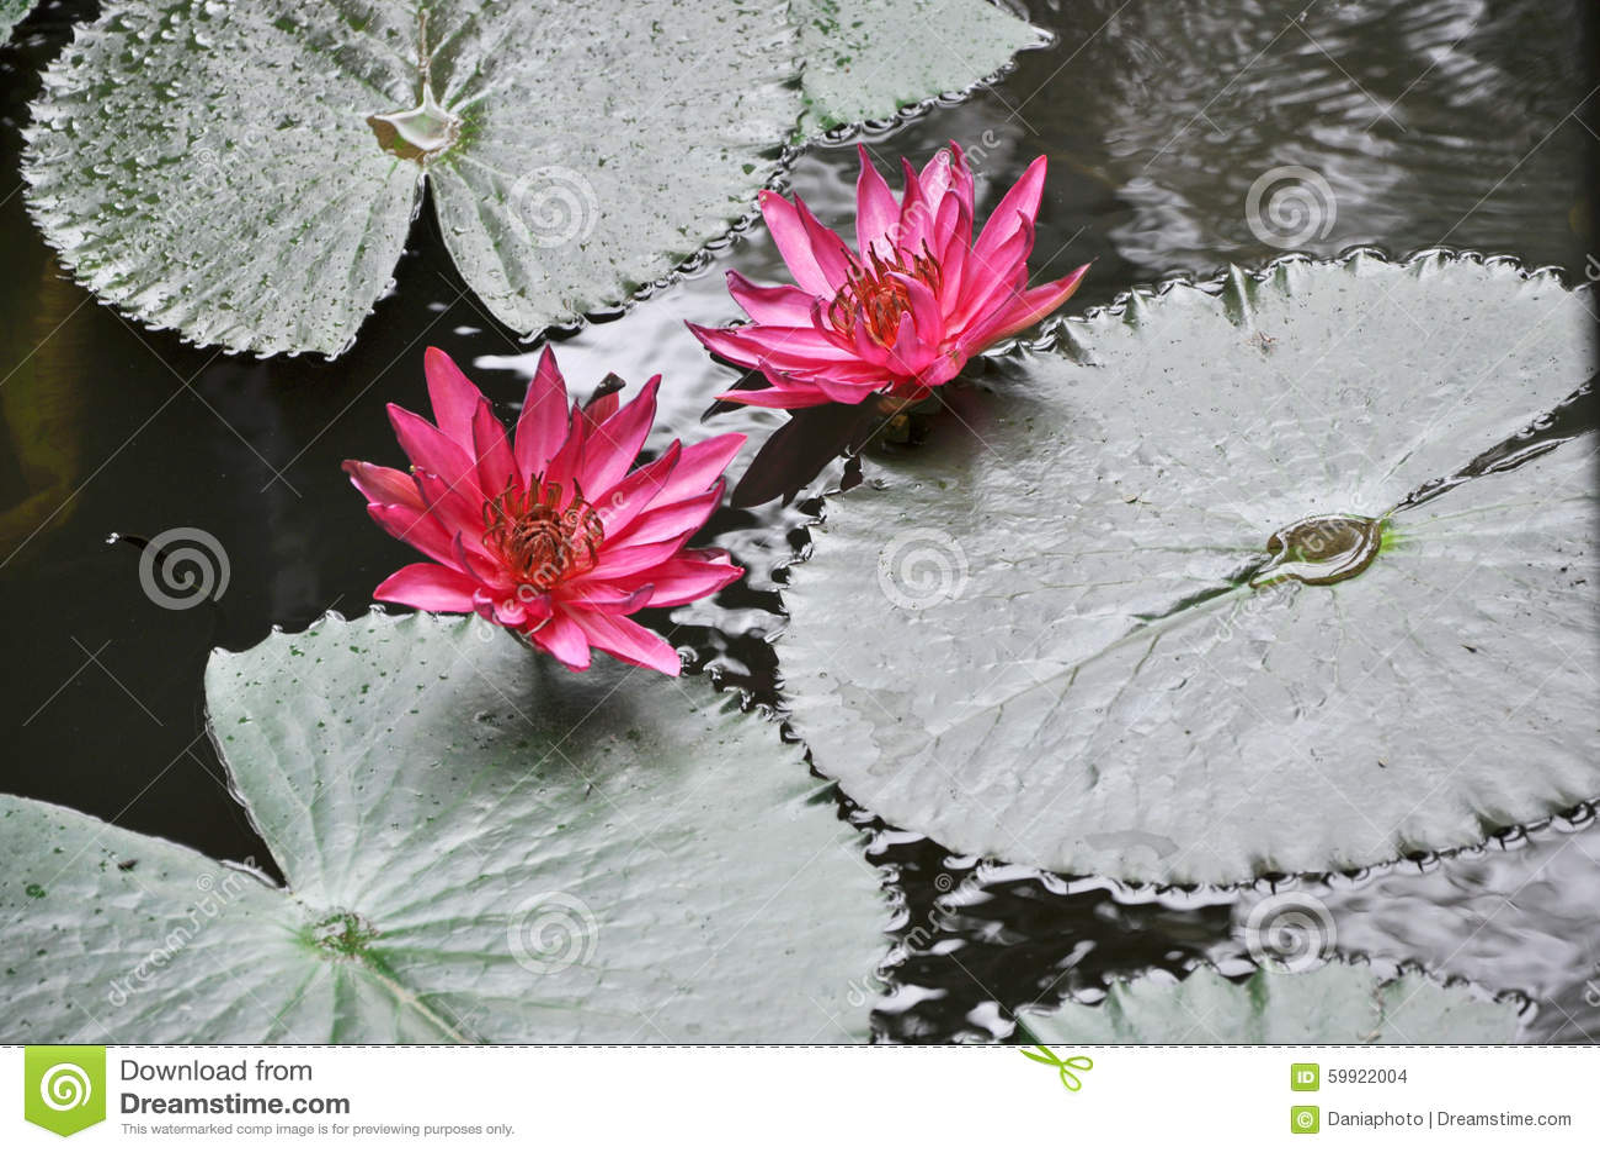 Pink lotus blooming on pond